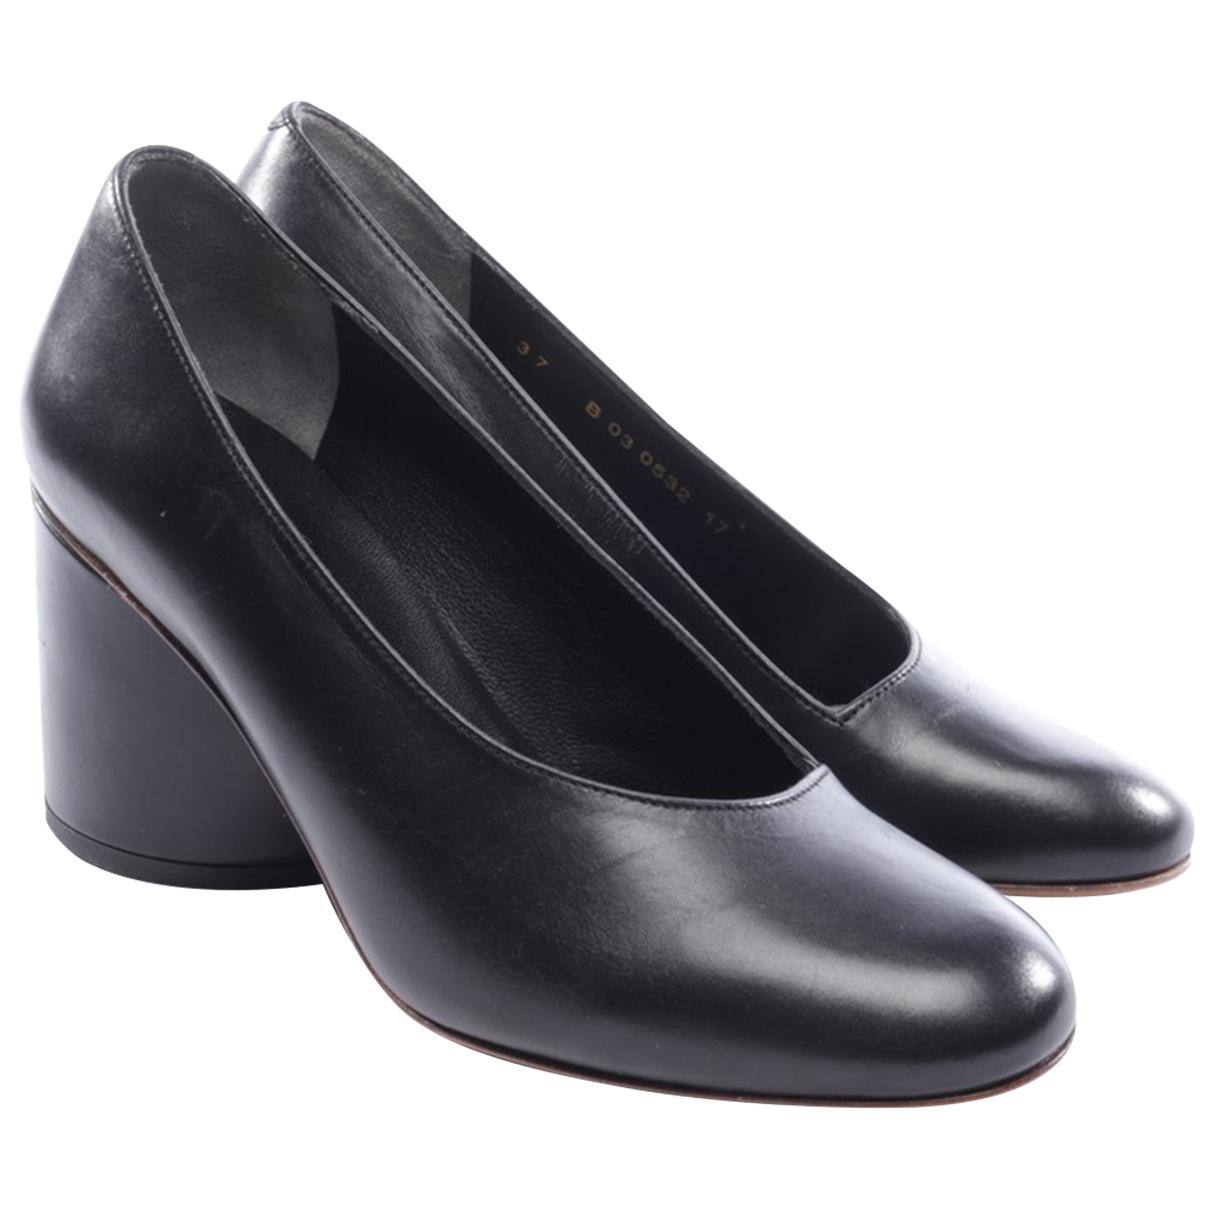 Robert Clergerie N Black Leather Heels for Women 39.5 EU